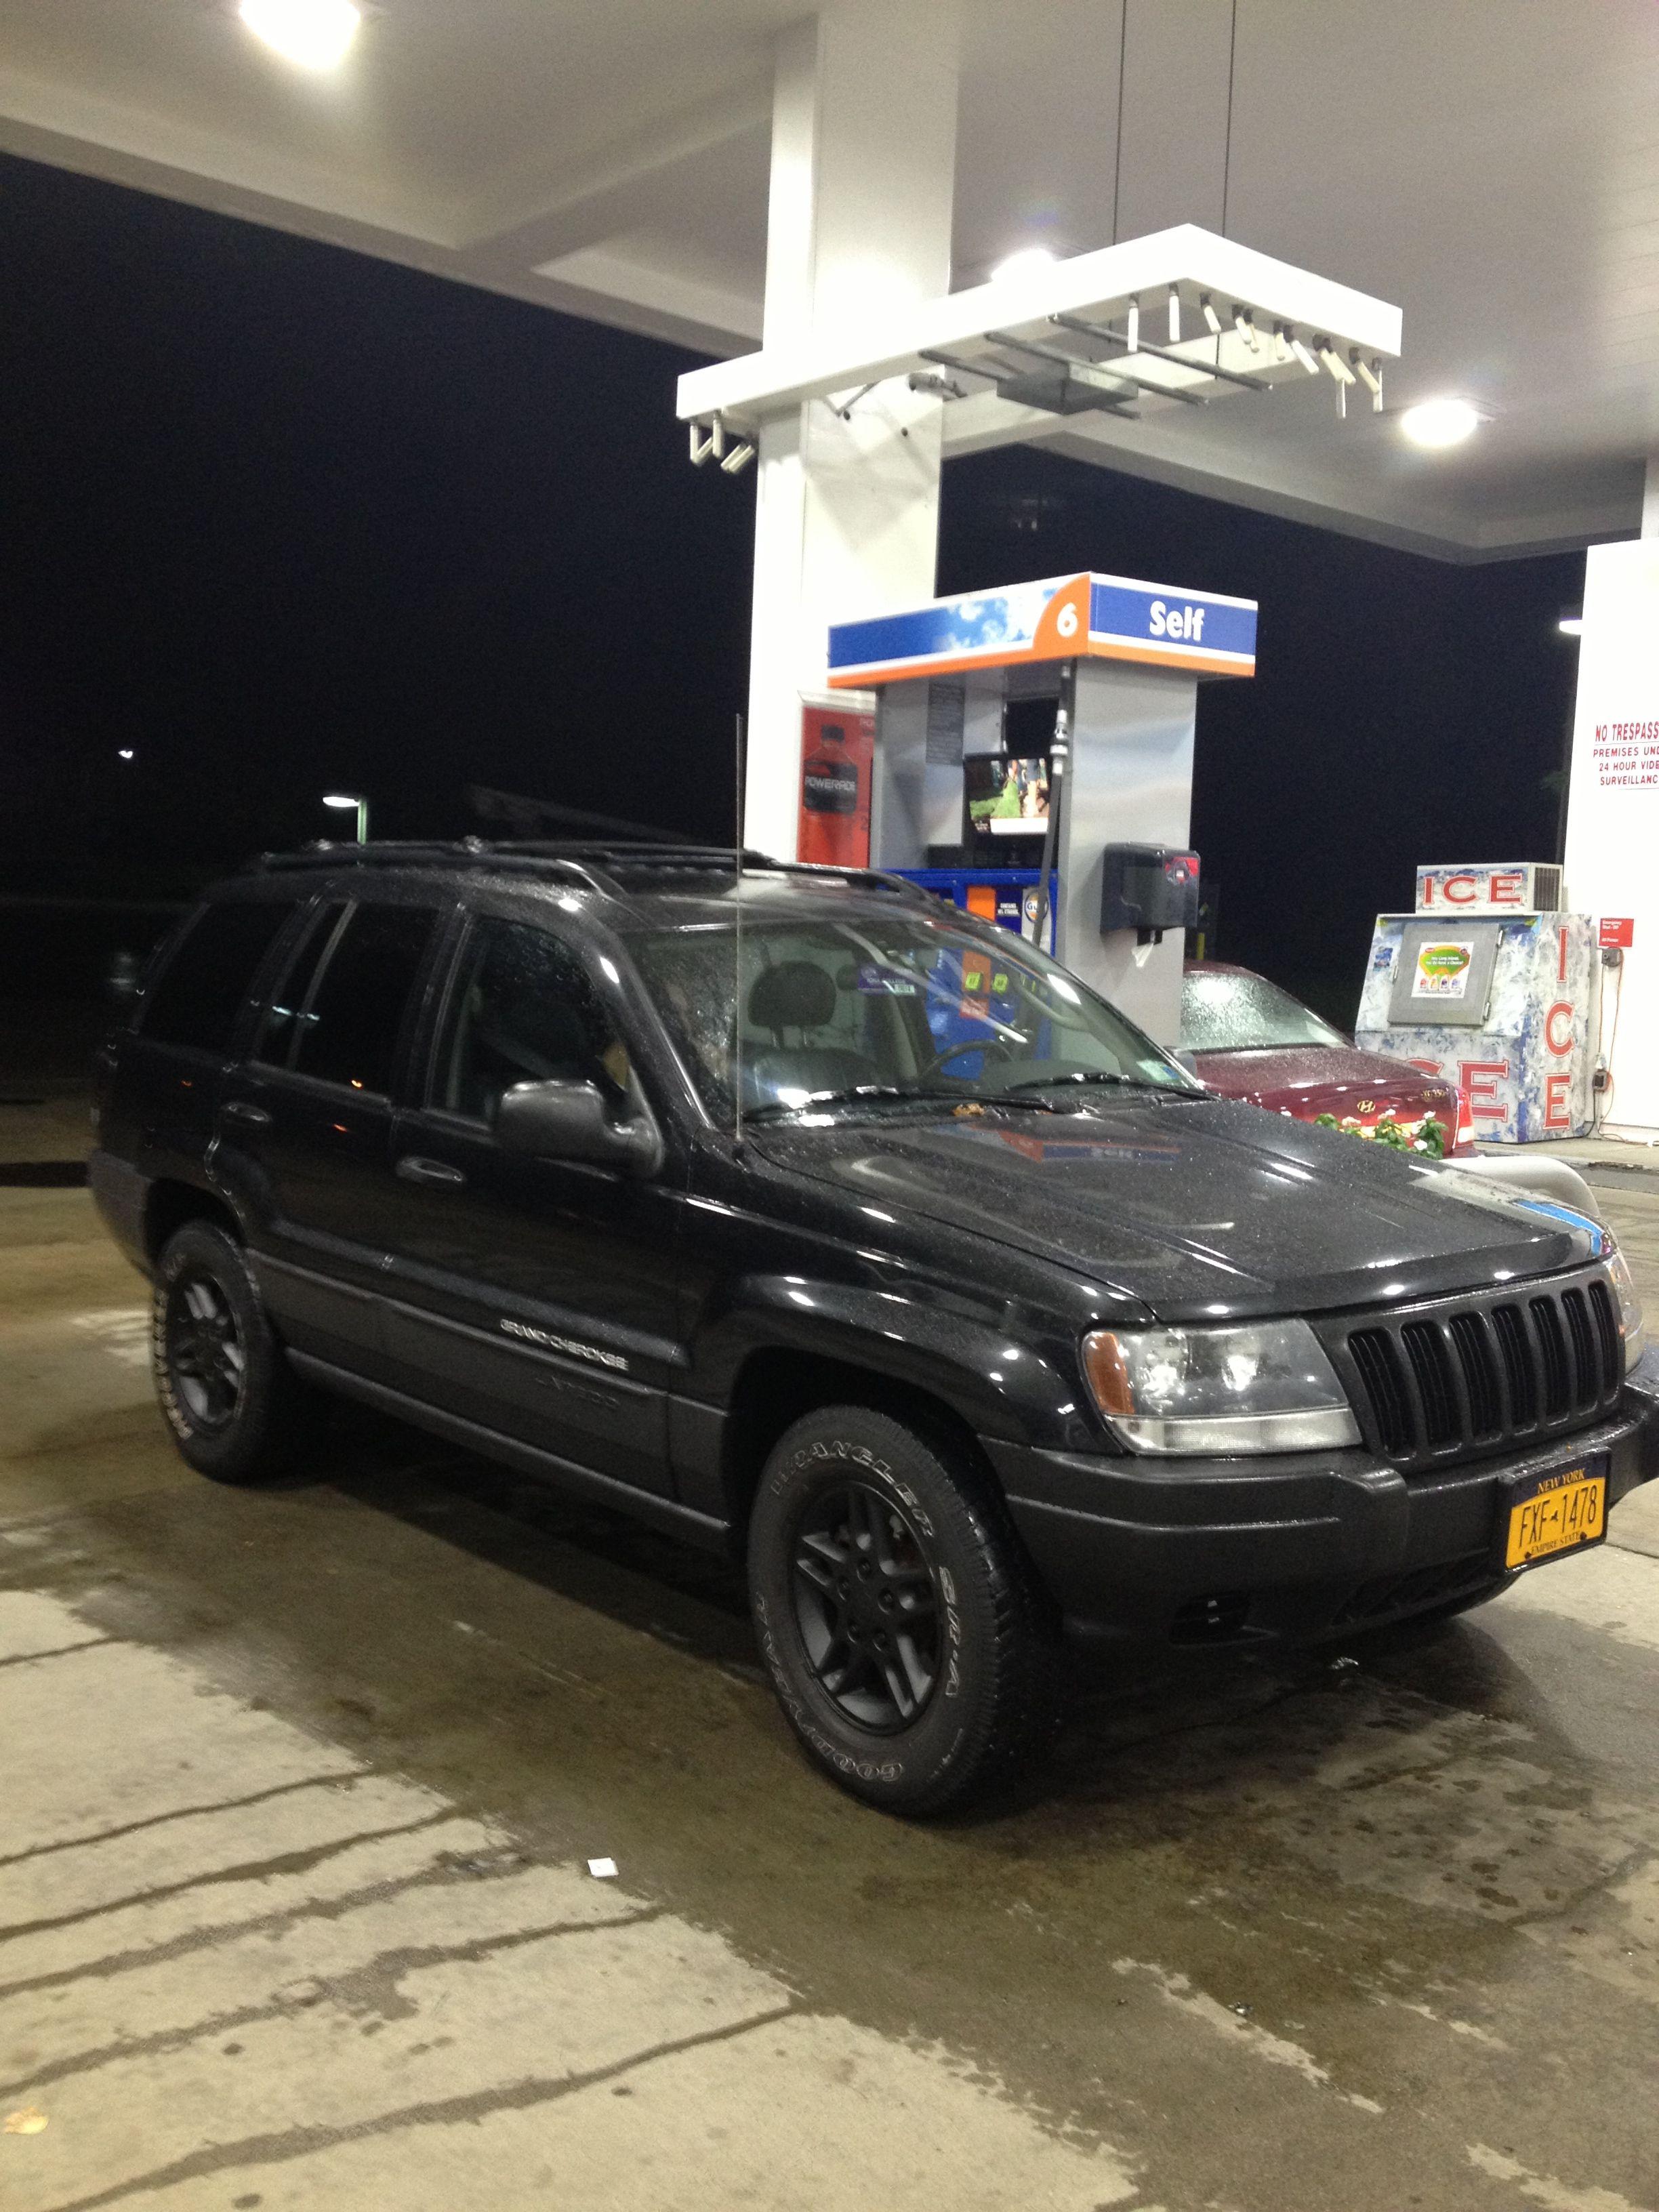 Blacked out jeep wj grand cherokee jeep wj jeep car